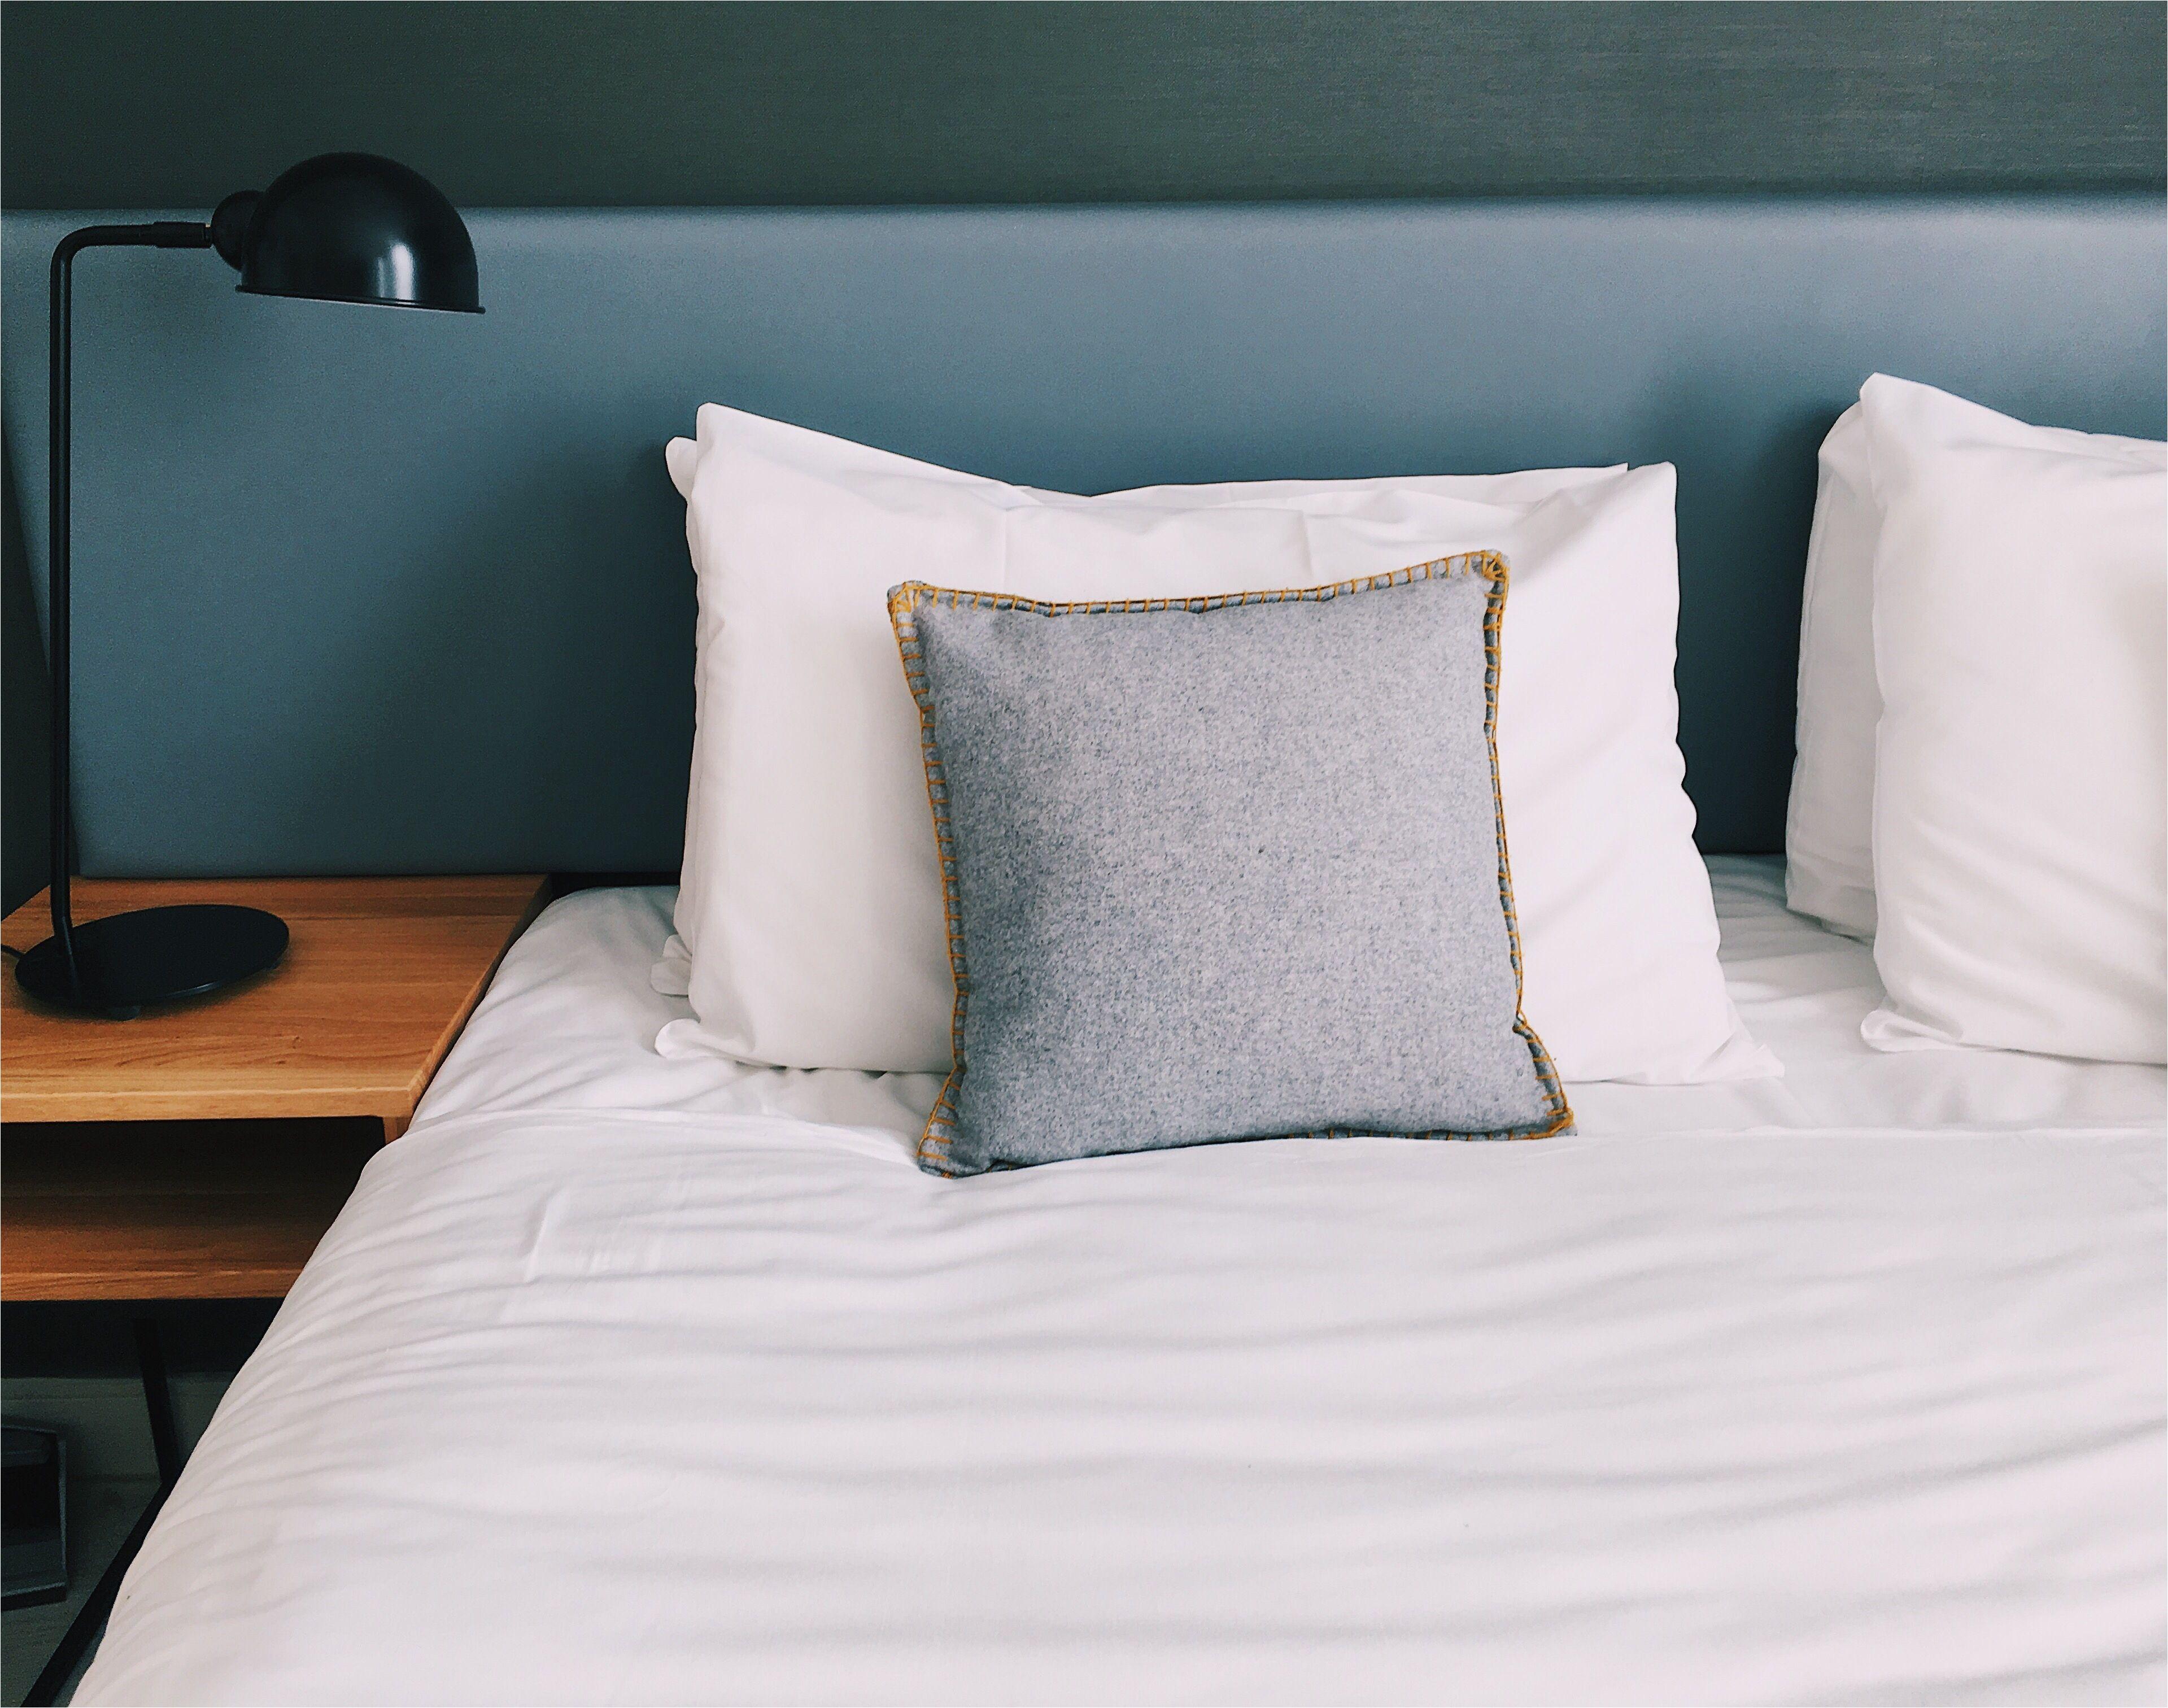 close up of empty bed at home 910097406 5b06259ea9d4f900370b5e60 jpg